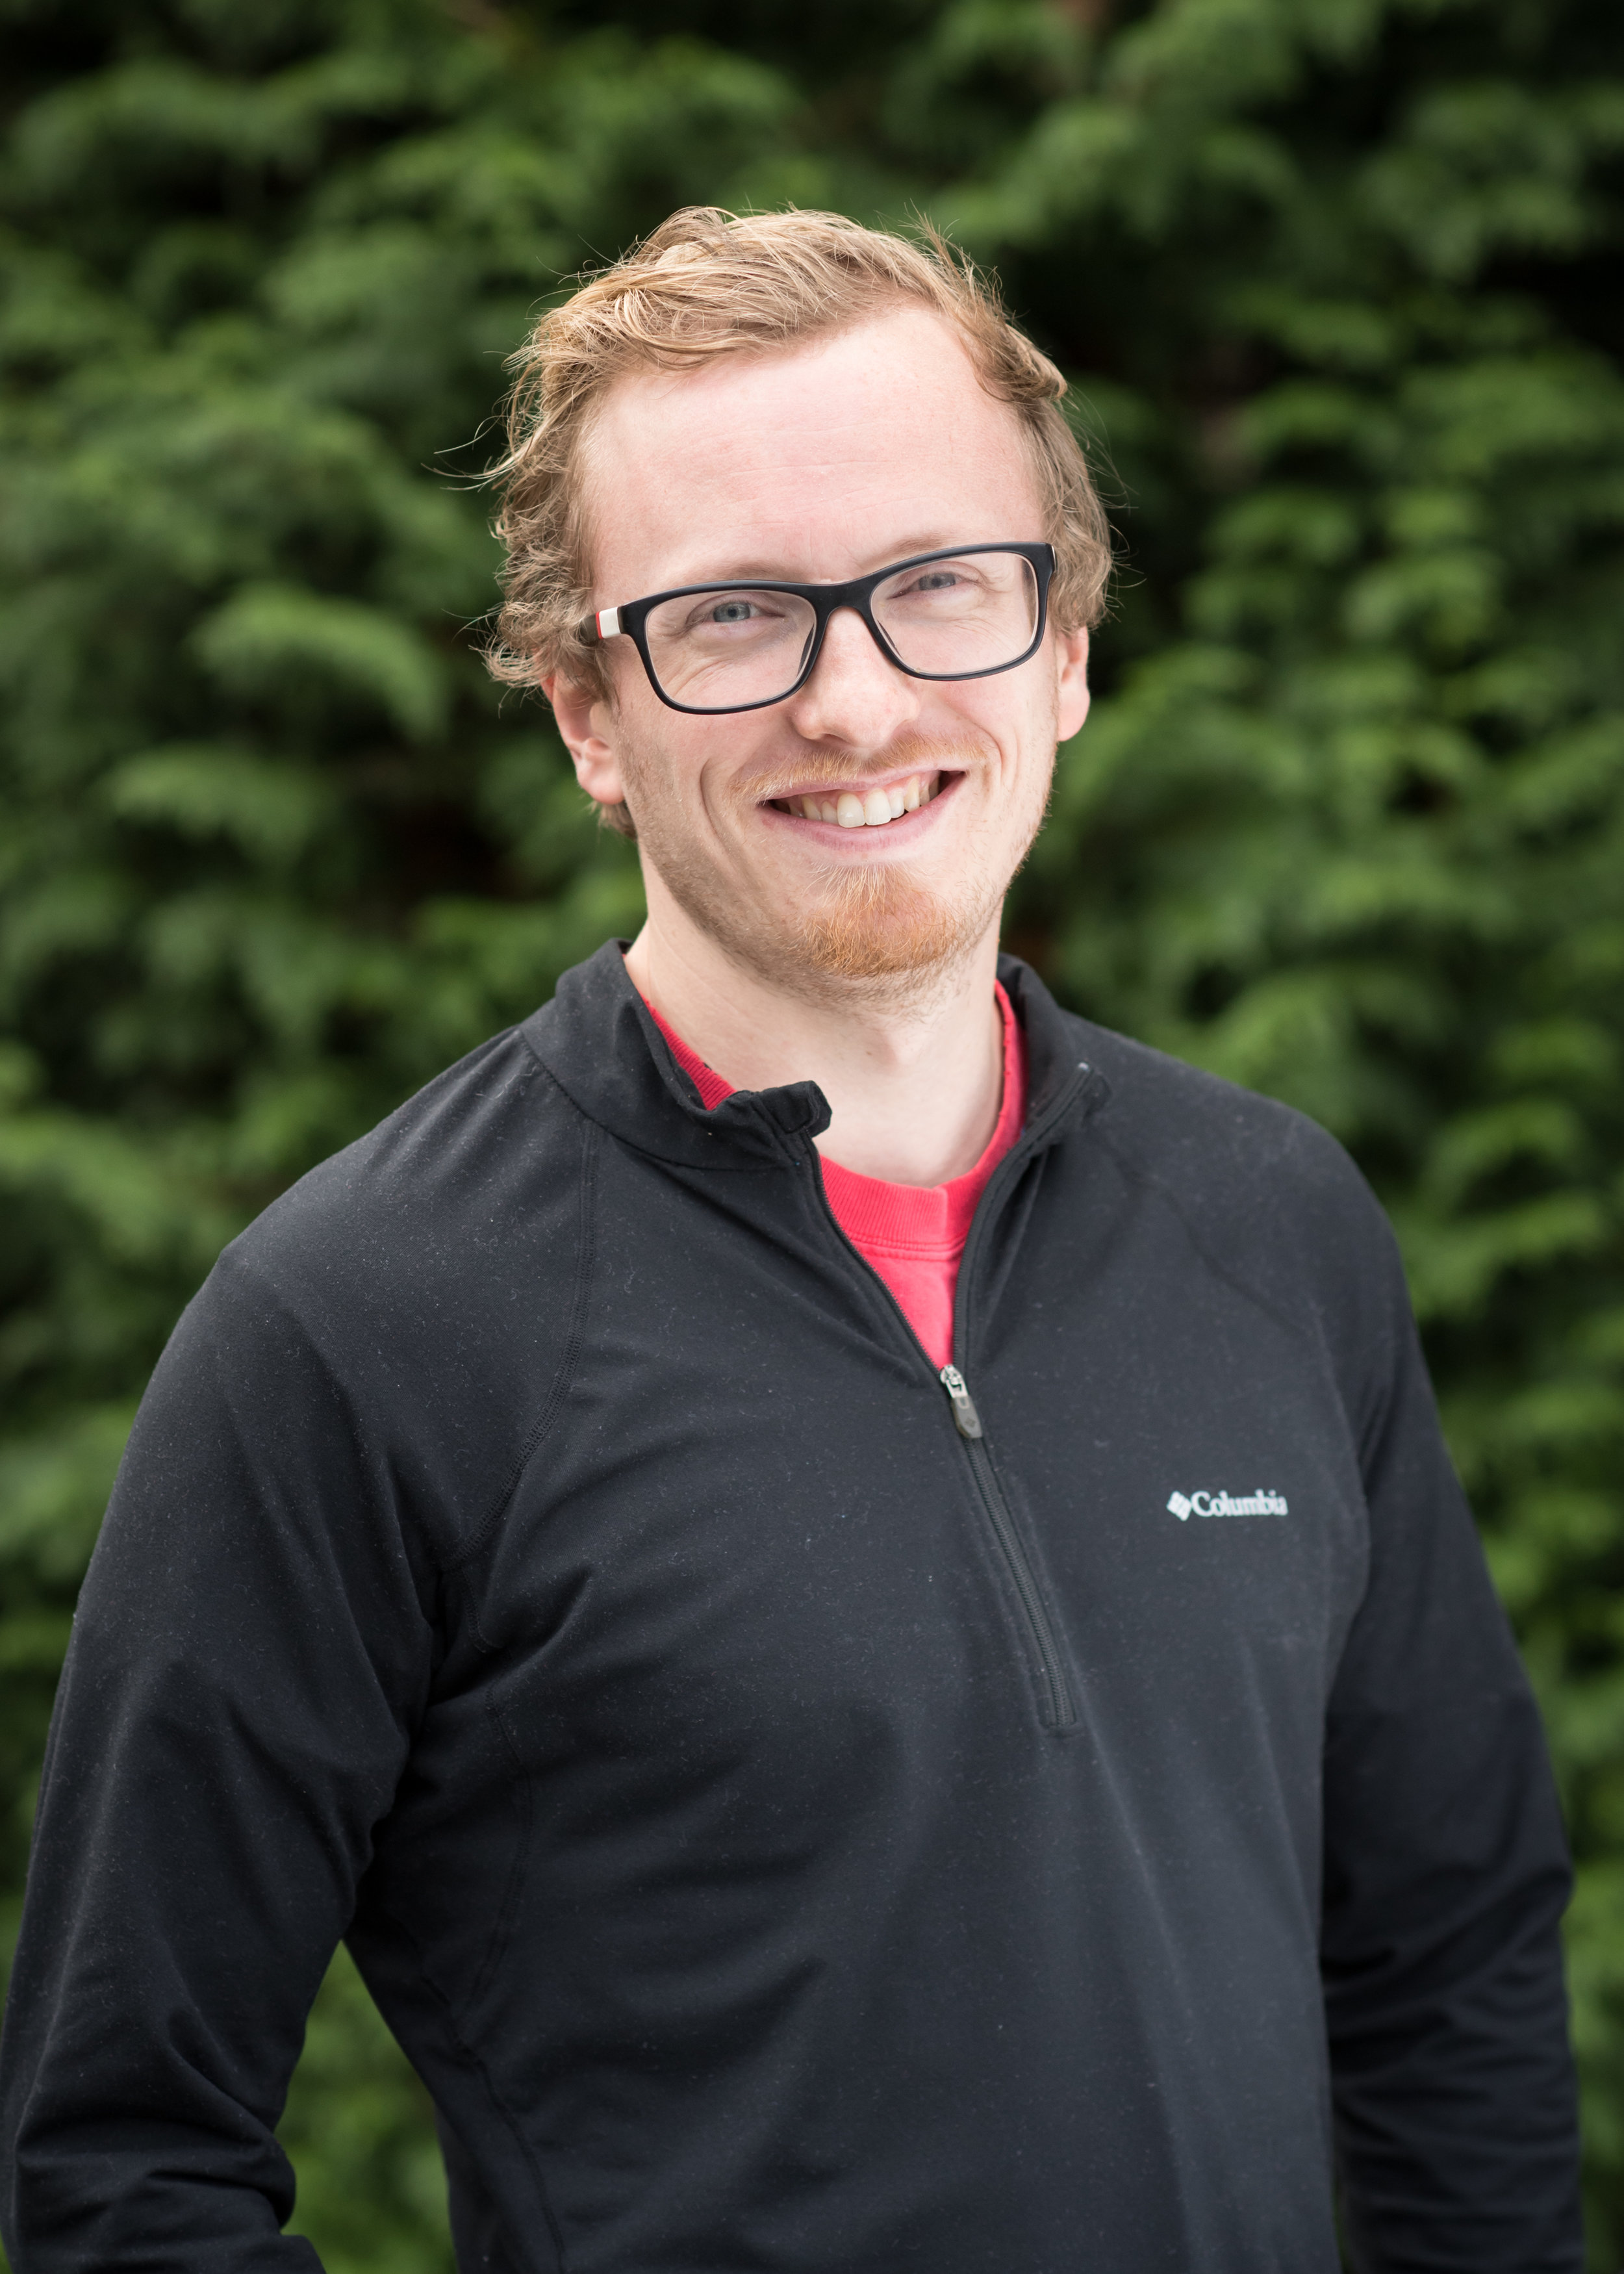 Eric Joy, Landscape and Member Services